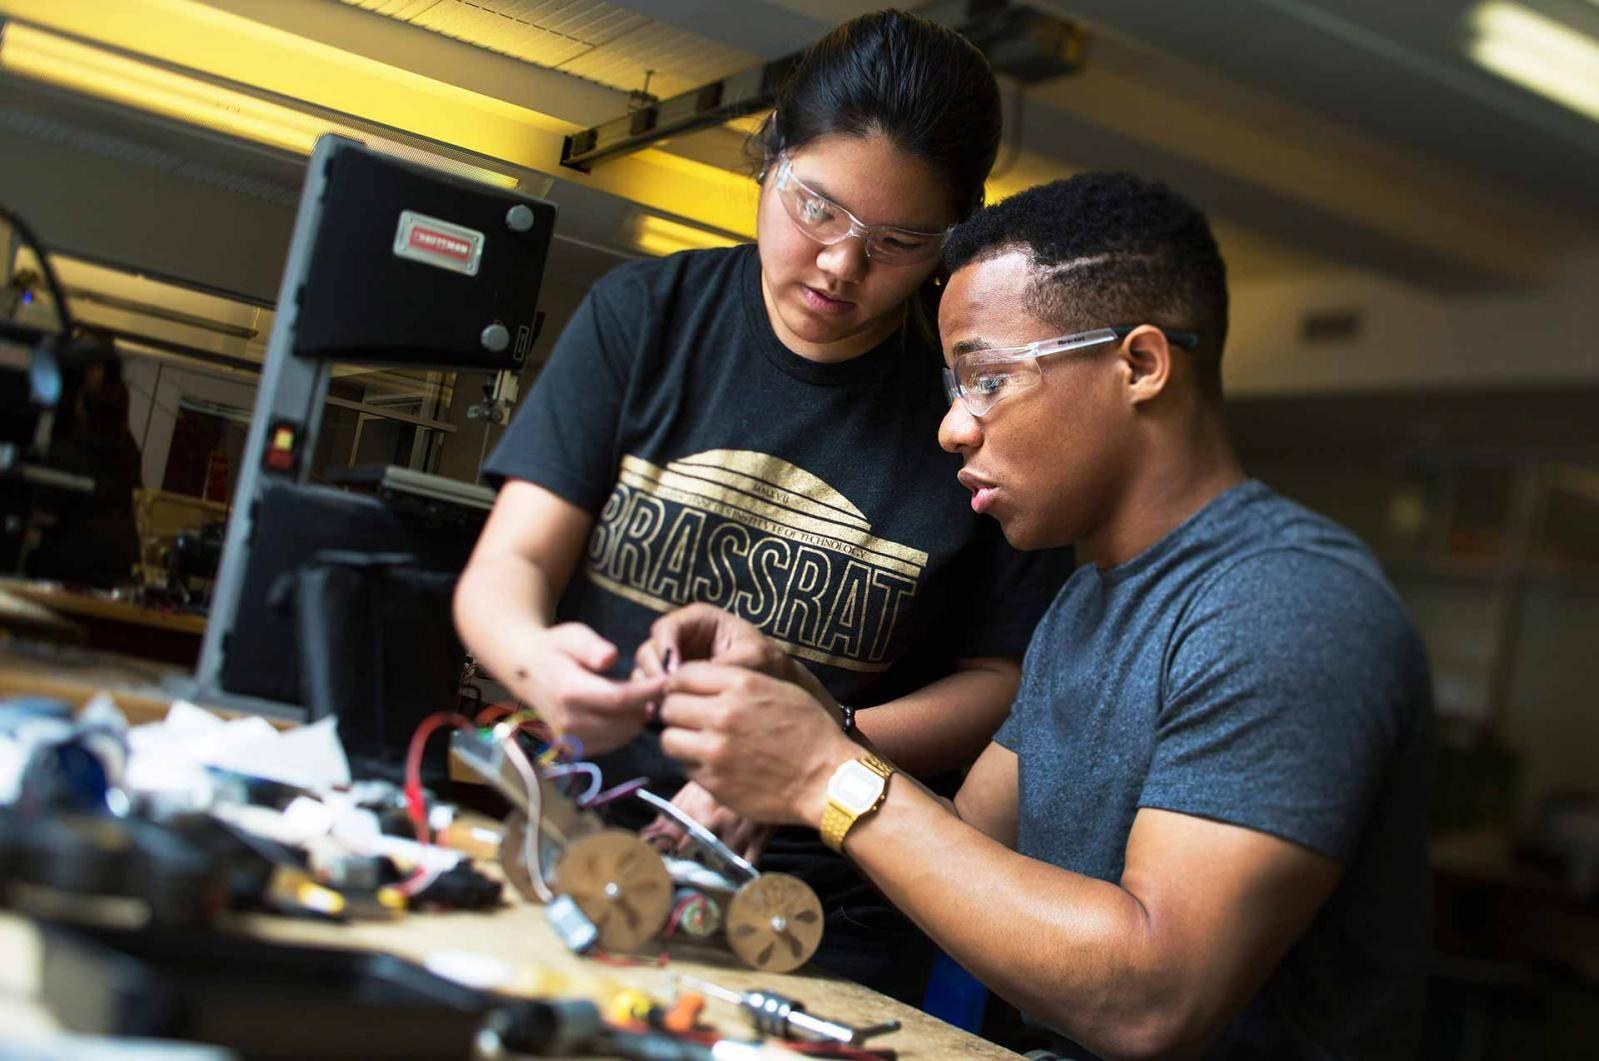 mit graduate application mechanical engineering